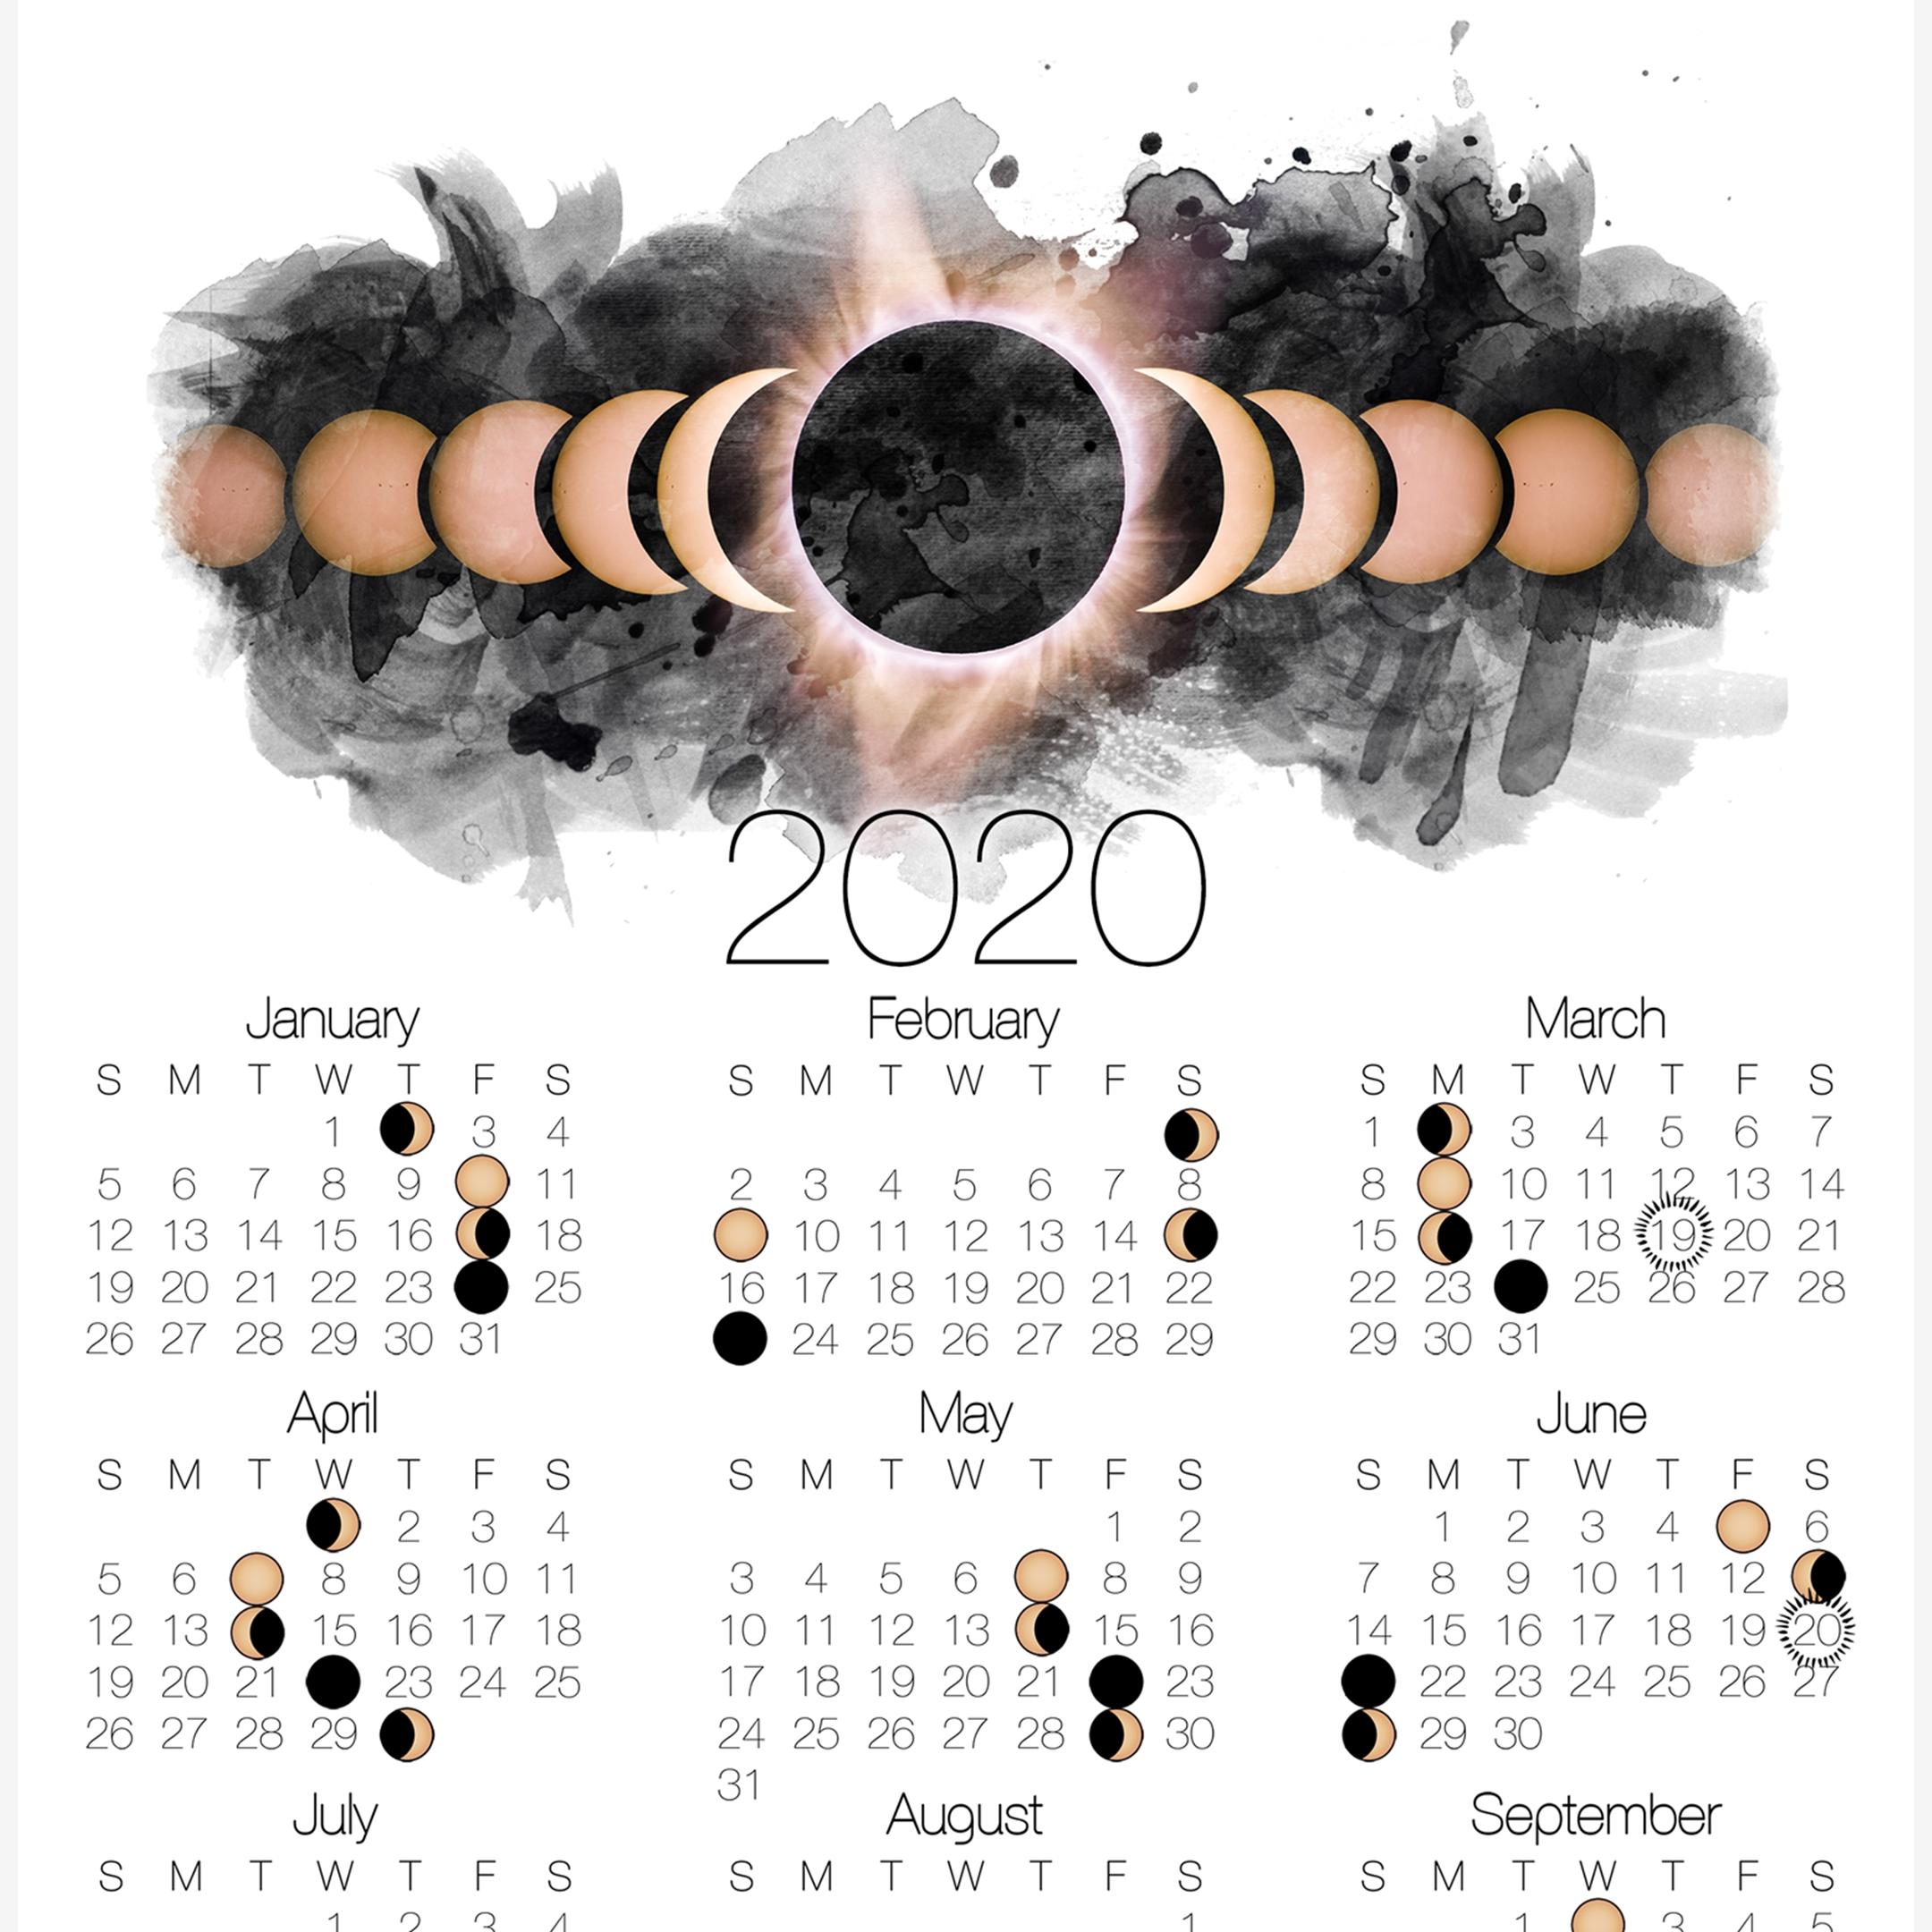 2020 Moon Phase Calendar With Solar Eclipse In 2020 | Moon  Solar Lunar Calendar 2020